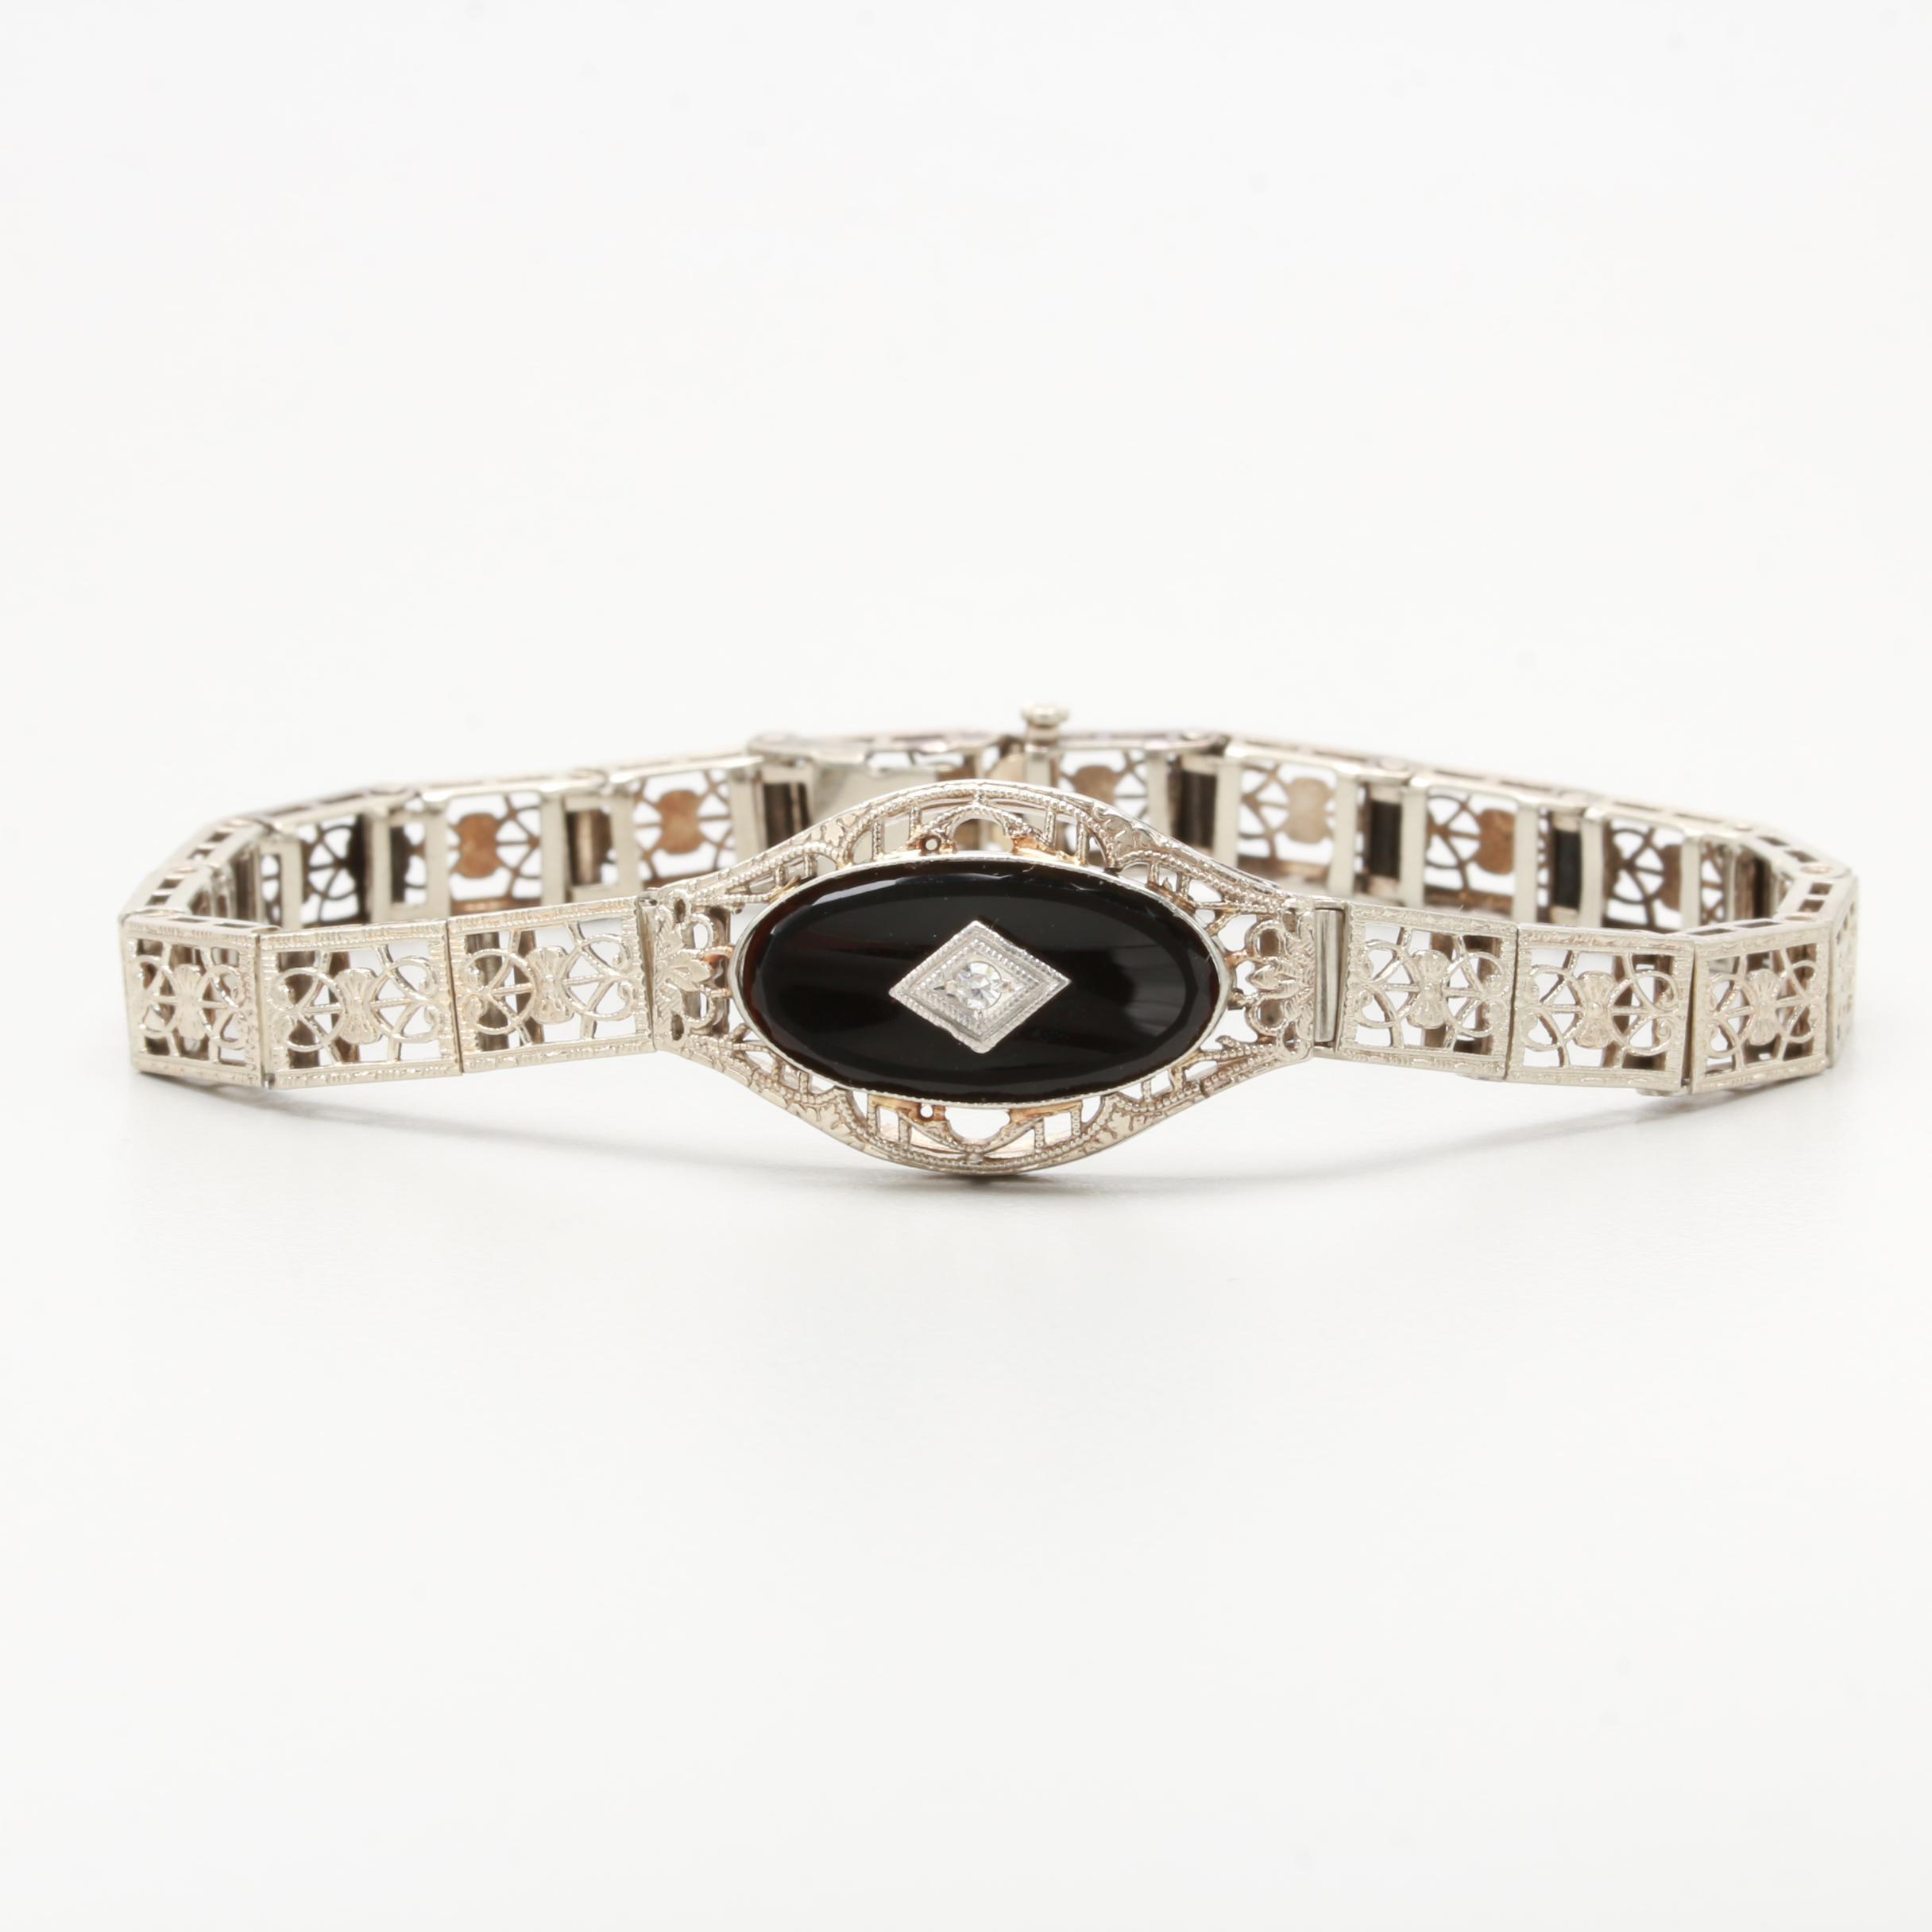 Art Deco 14K White Gold Black Onyx and Diamond Bracelet